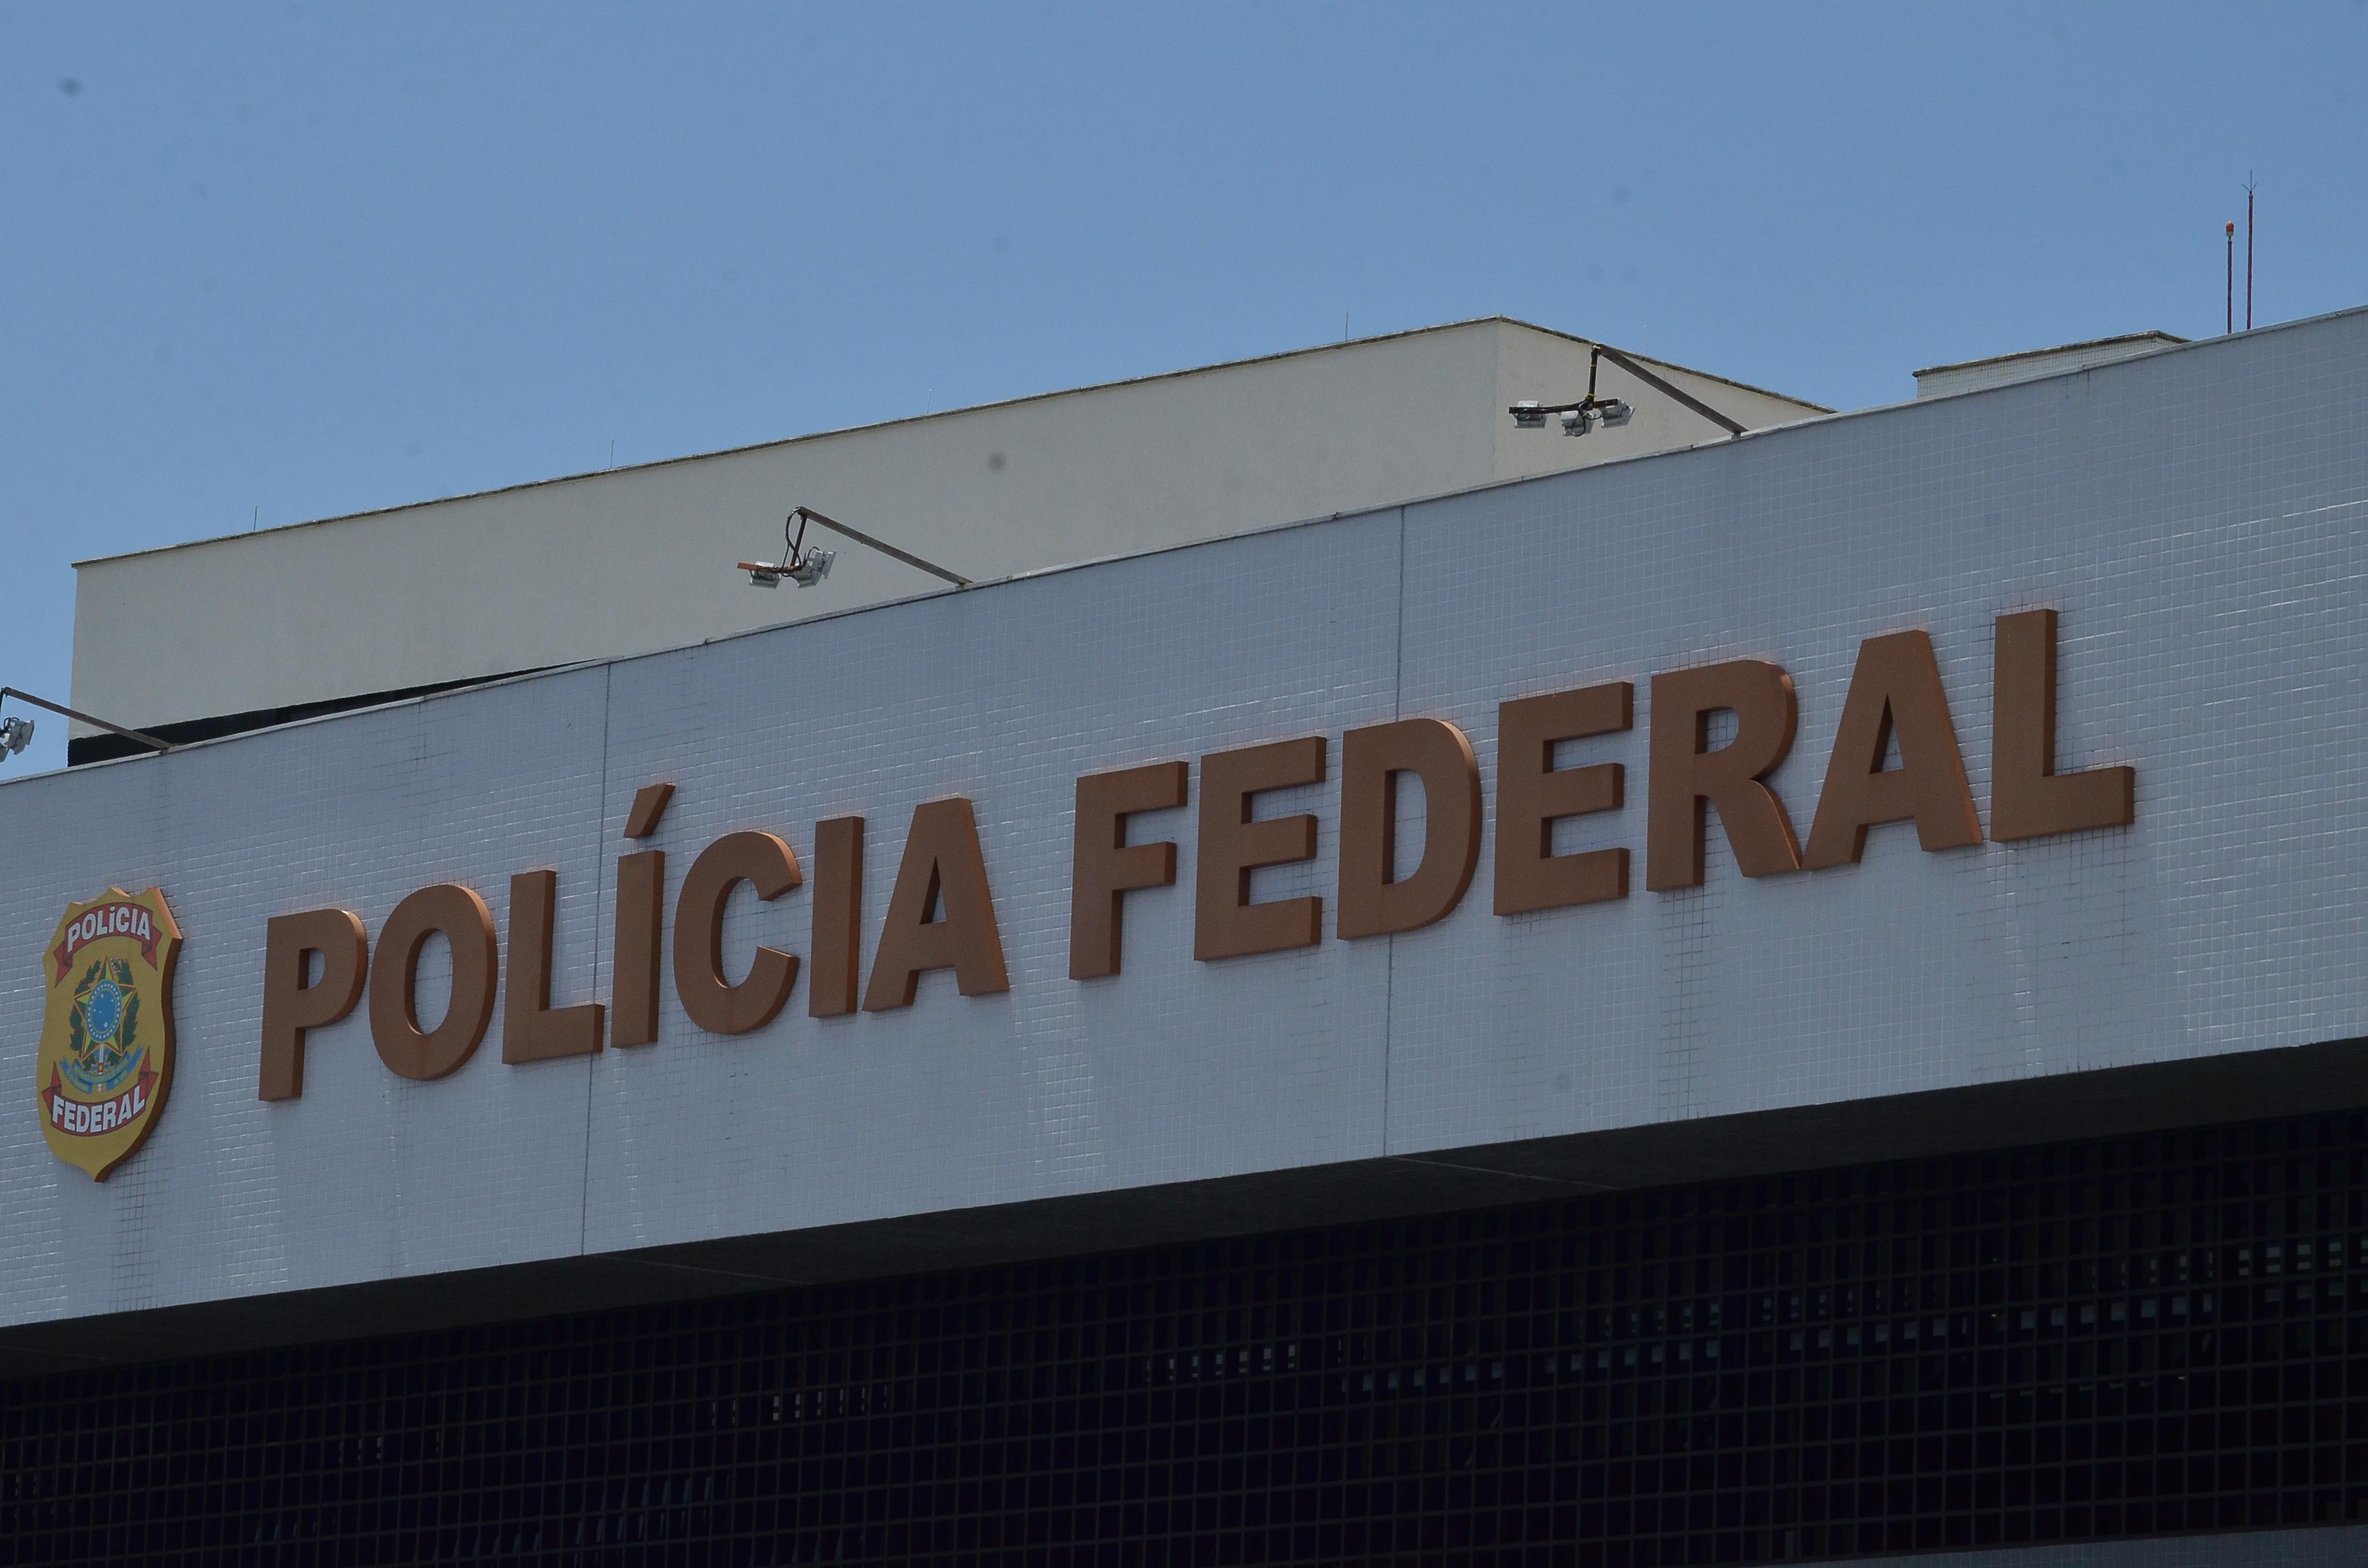 Policia Federal Coletiva 15